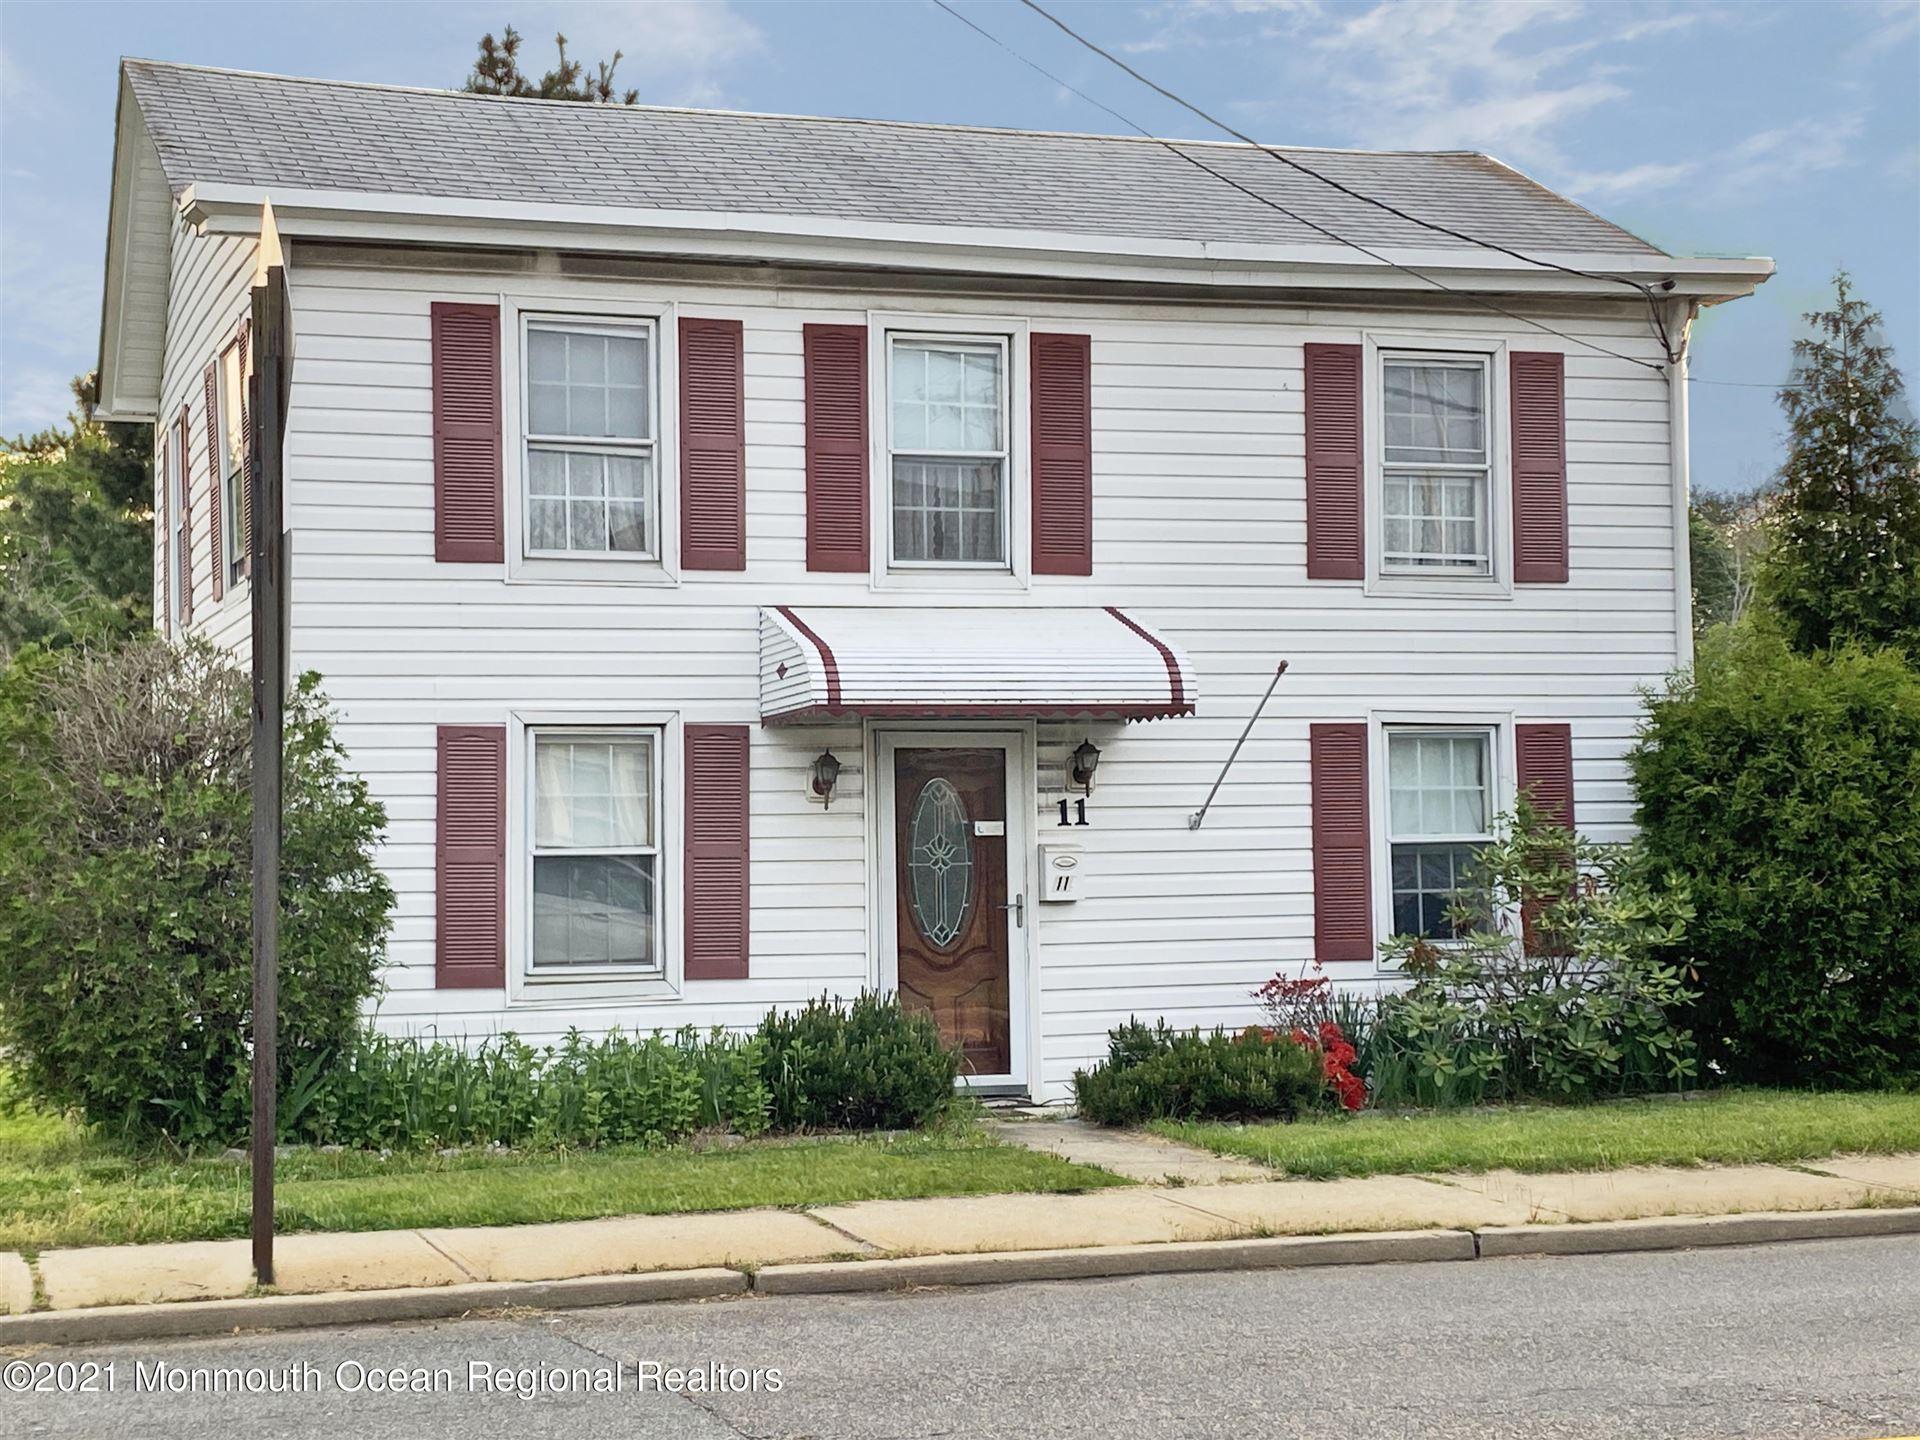 11 S Main Street, Englishtown, NJ 07726 - MLS#: 22114131